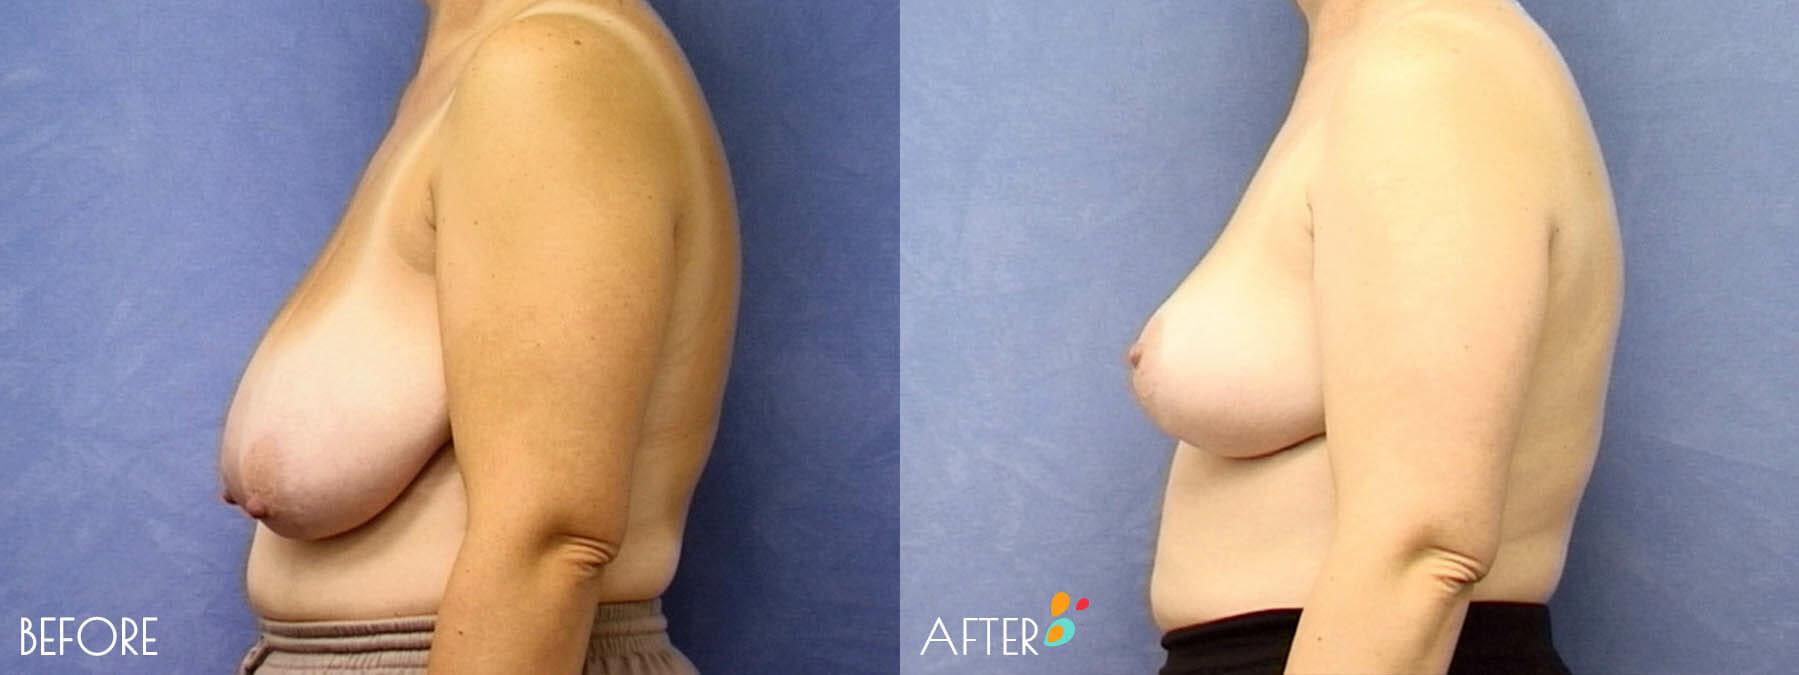 Breast Lift Patient 06, Side